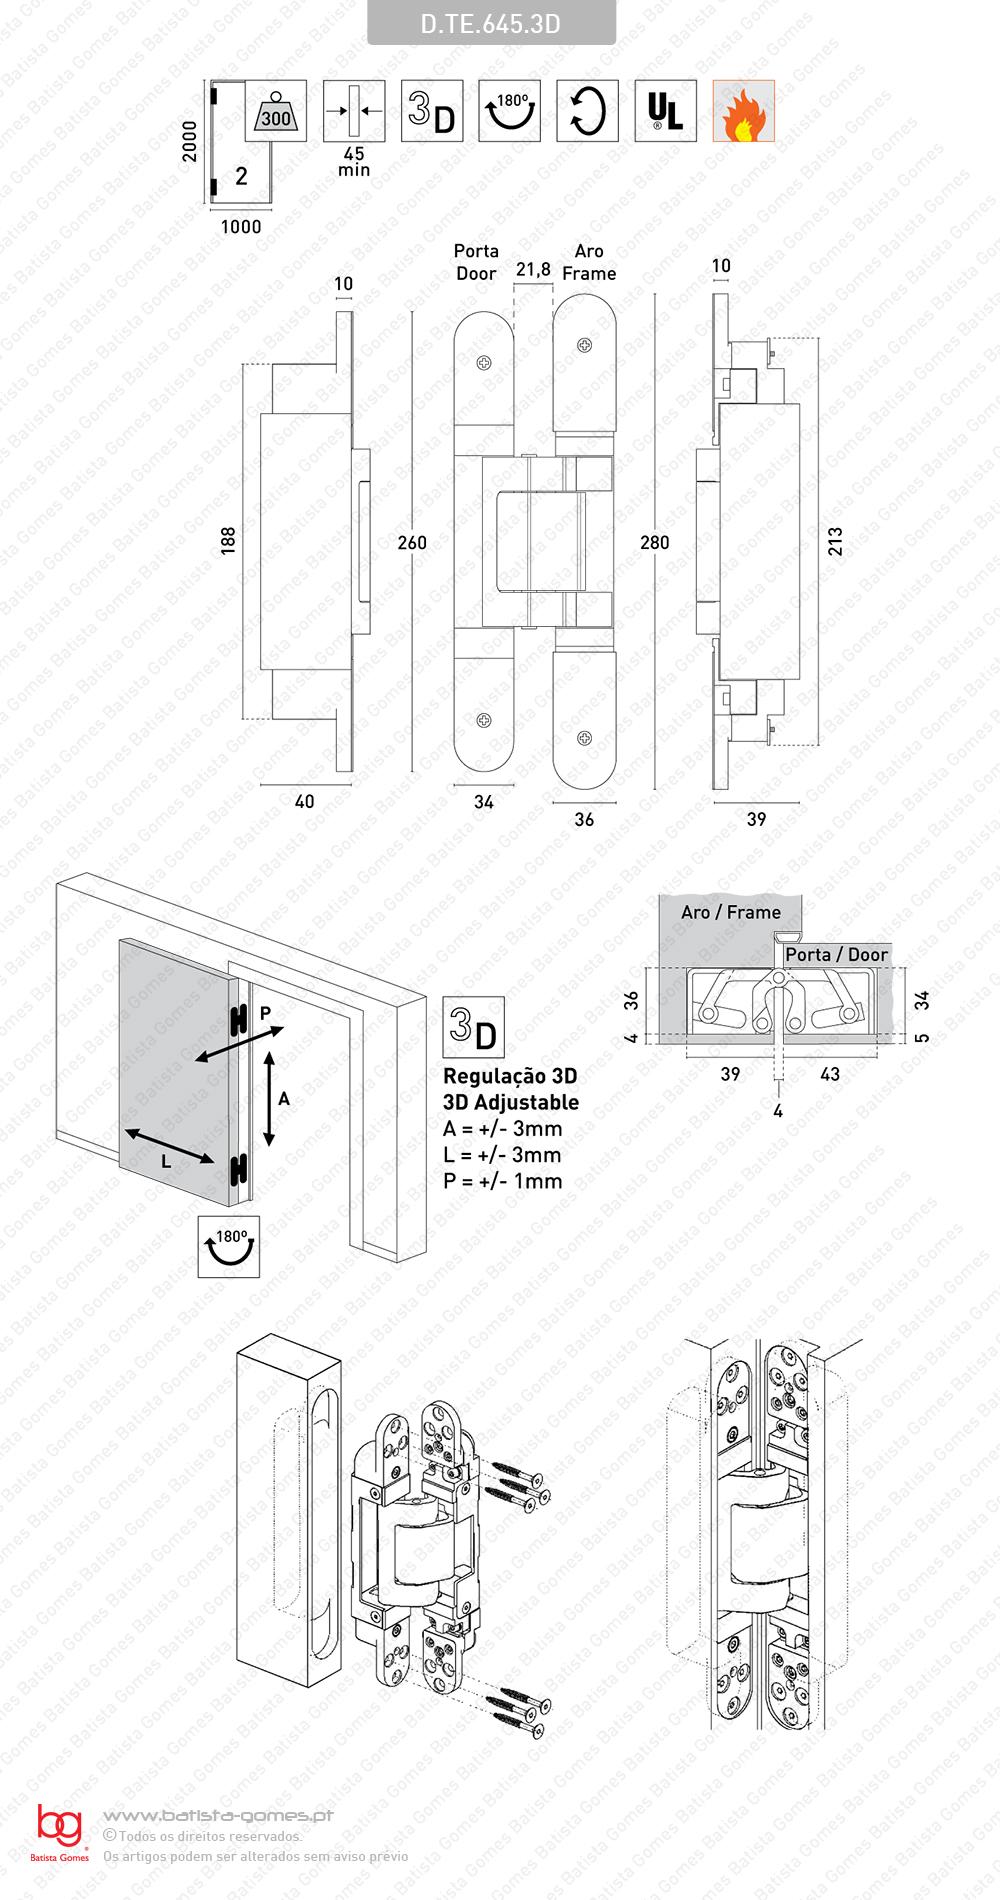 Dobradiça oculta / invisível TECTUS 3 D - Carga 300Kgs (2 Dobradiças)